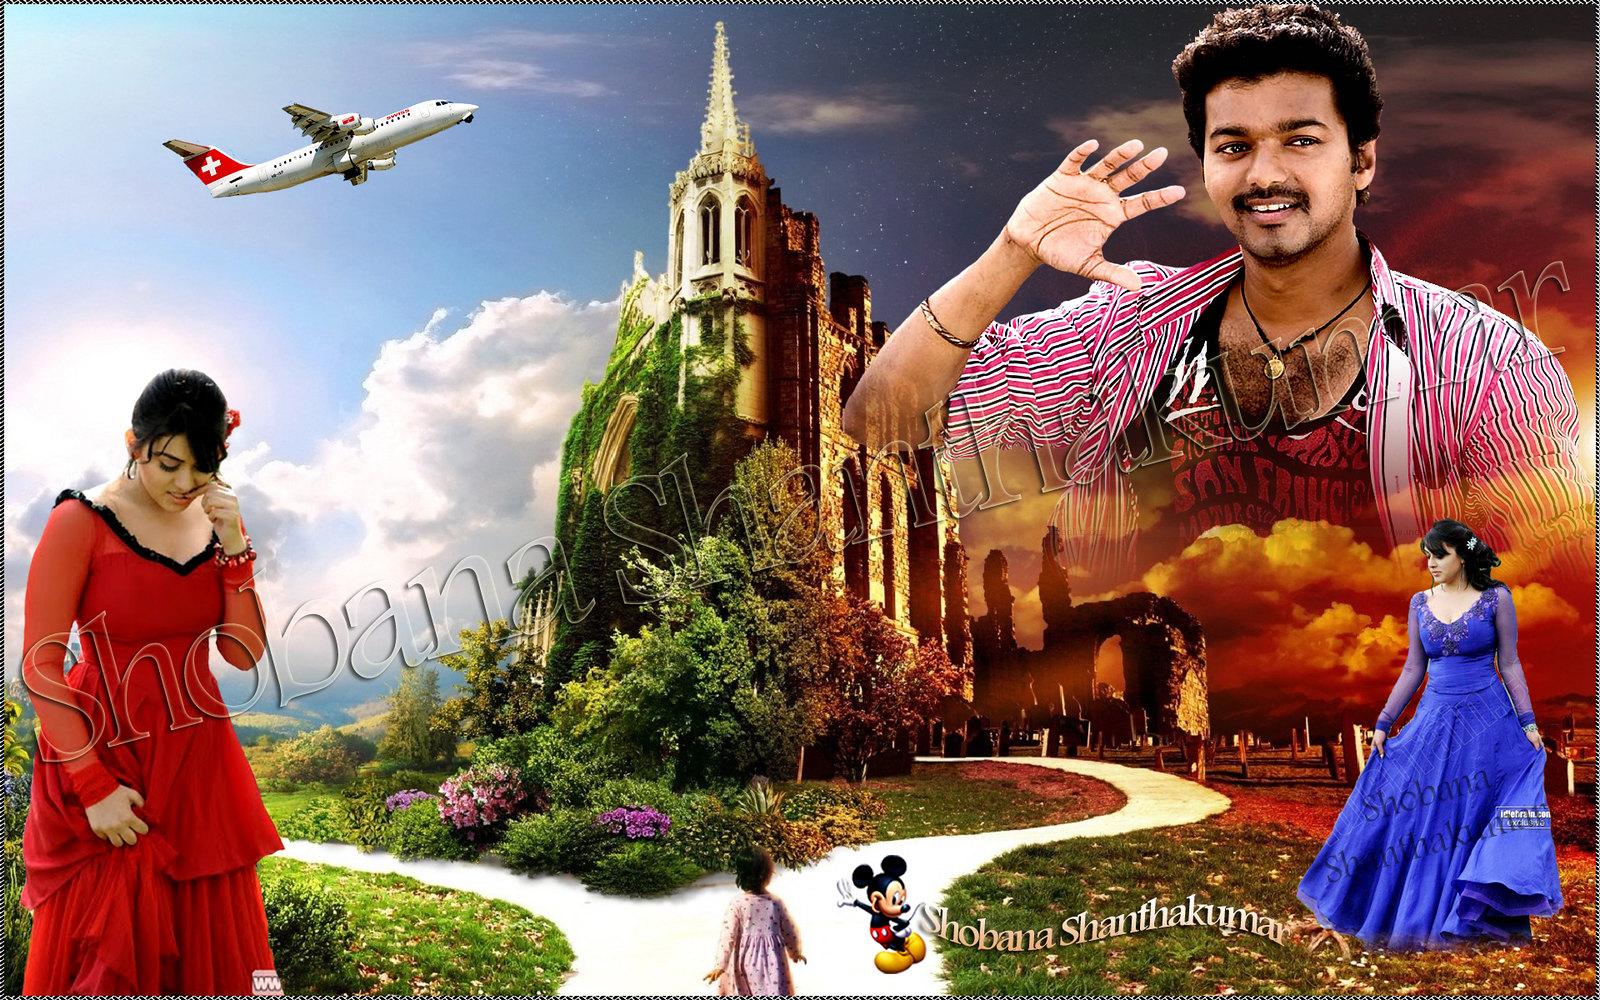 Hd wallpaper vijay - Hd Wallpaper Vijay 51